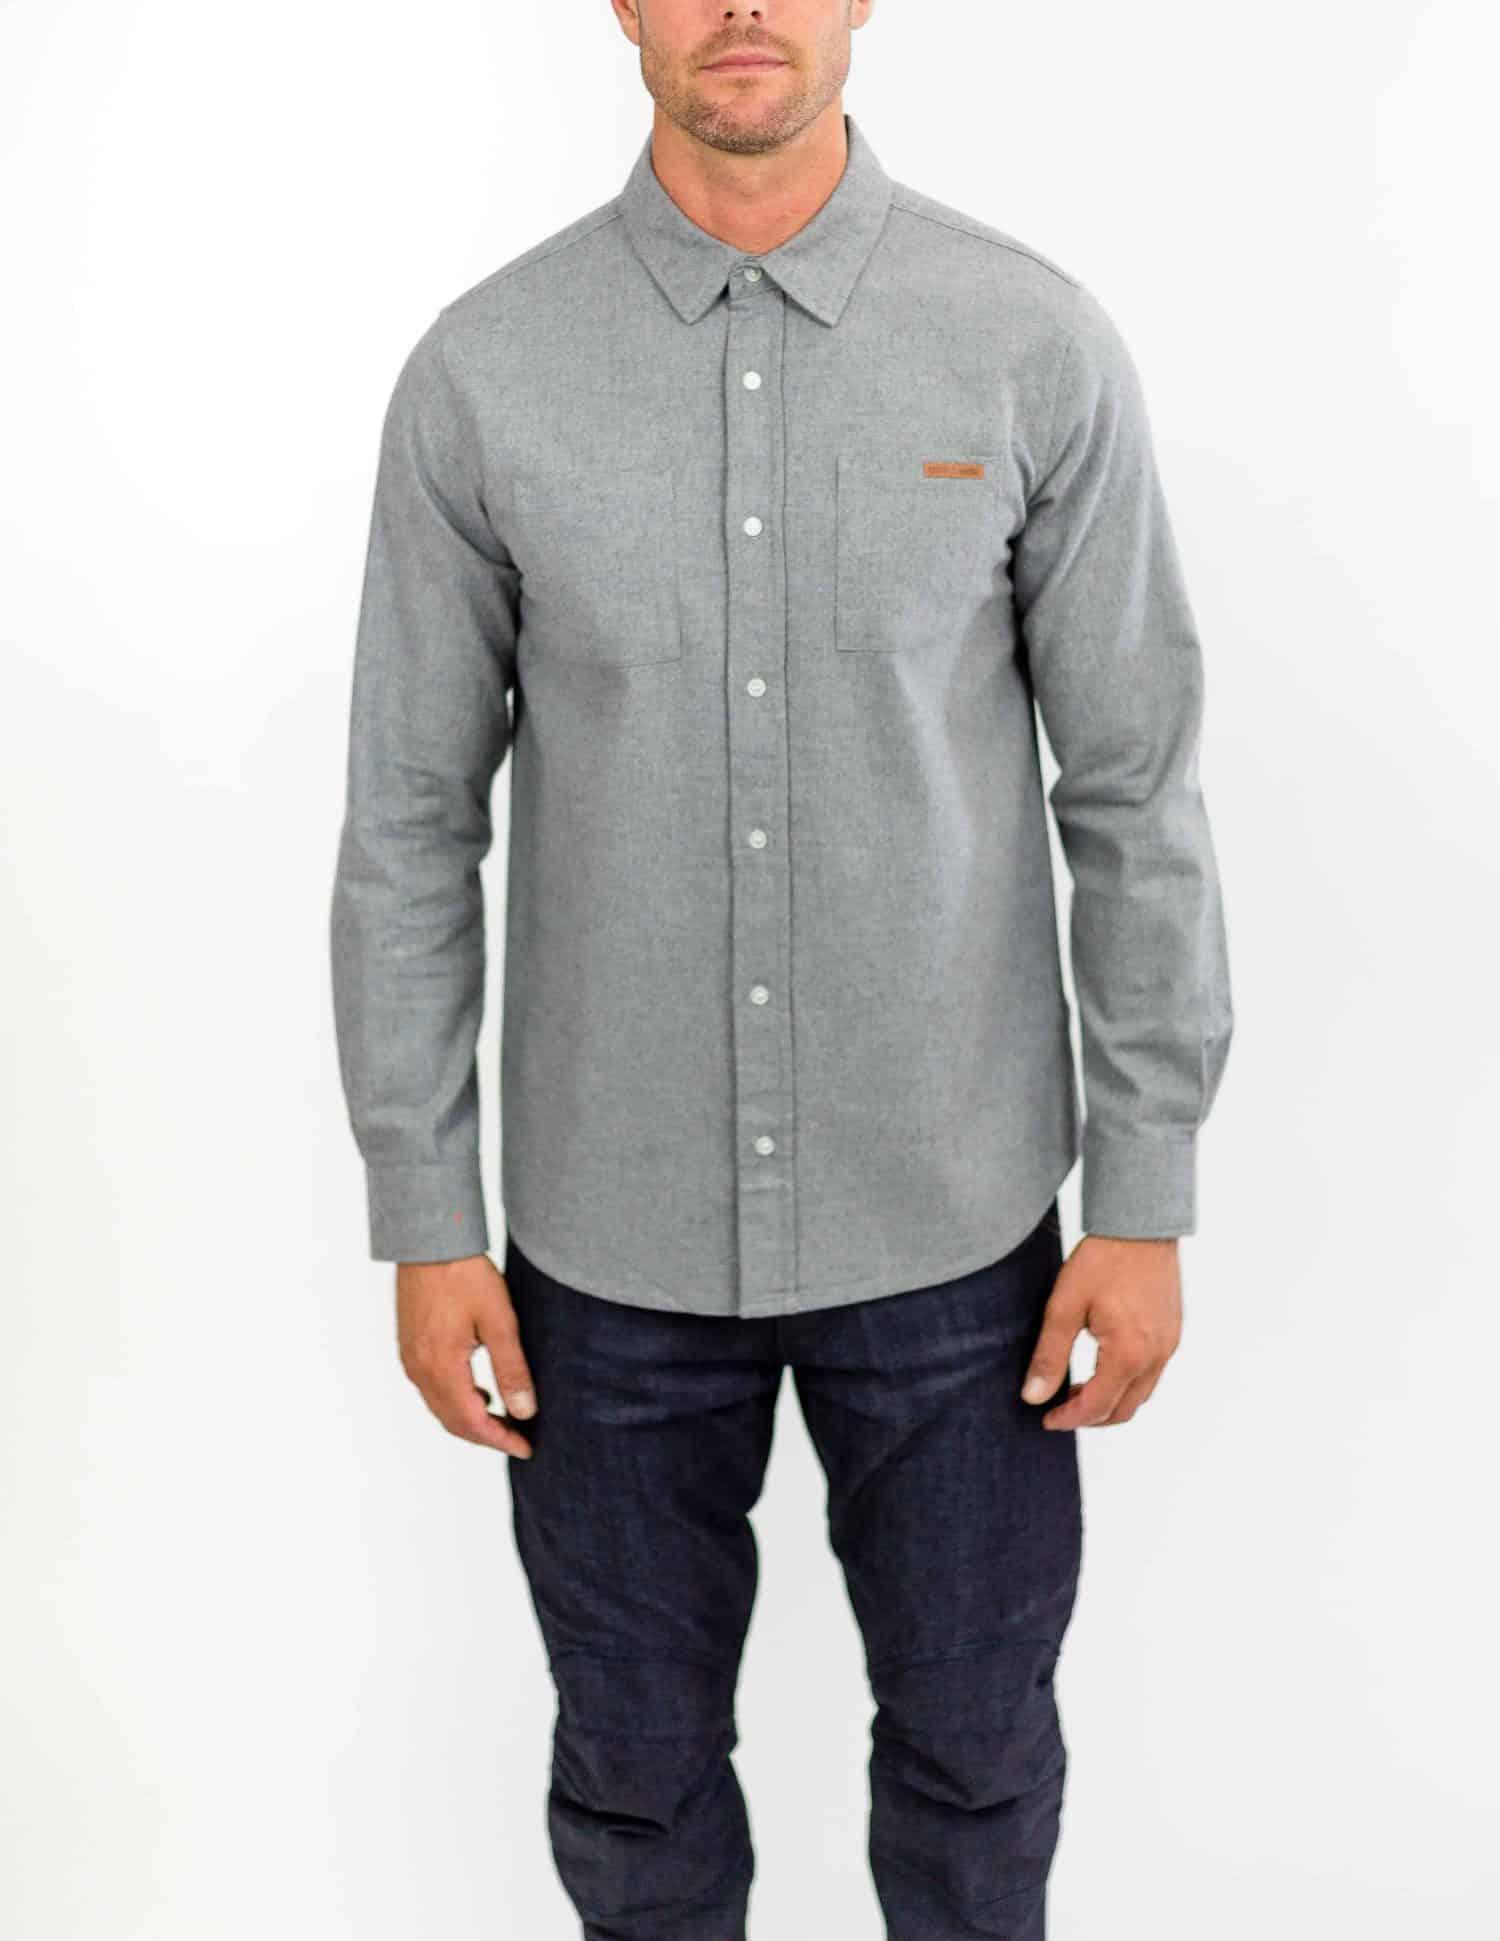 Ridgemont – Long Sleeve Riding Shirt